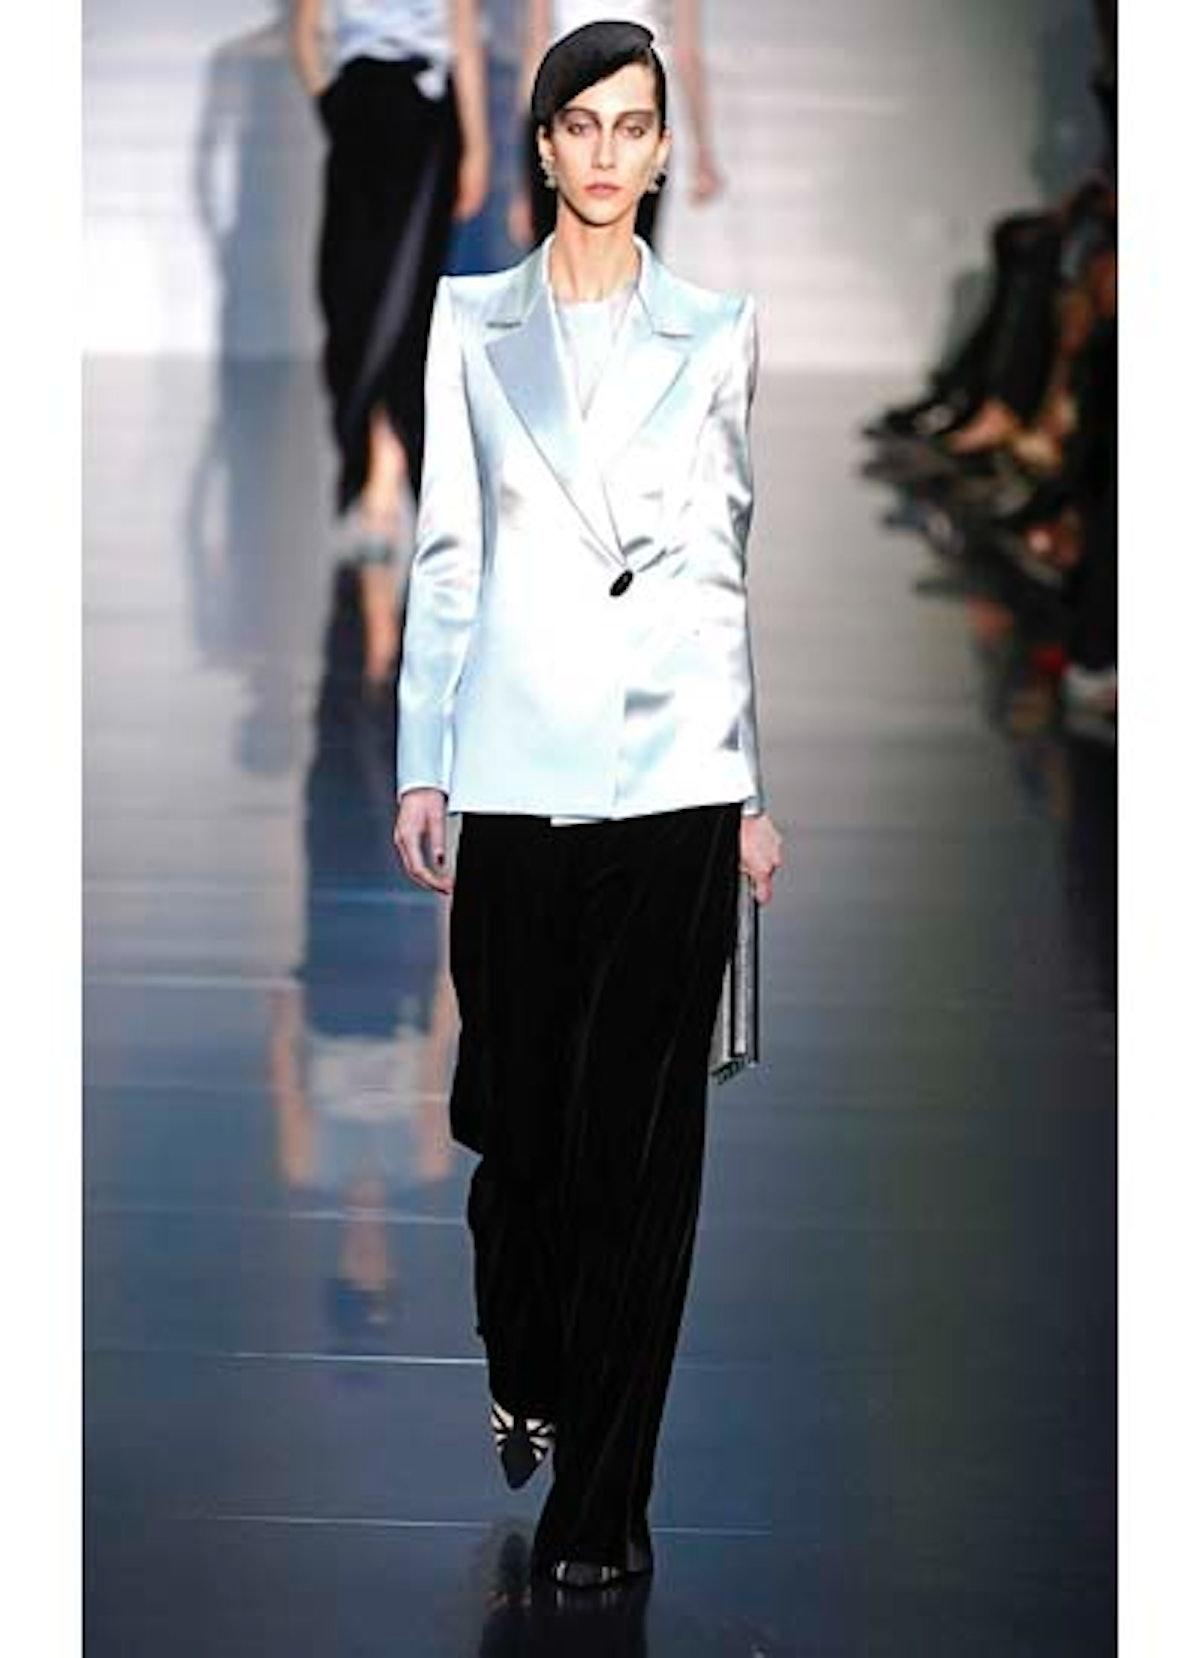 fass-giorgio-armani-couture-2012-runway-12-v.jpg